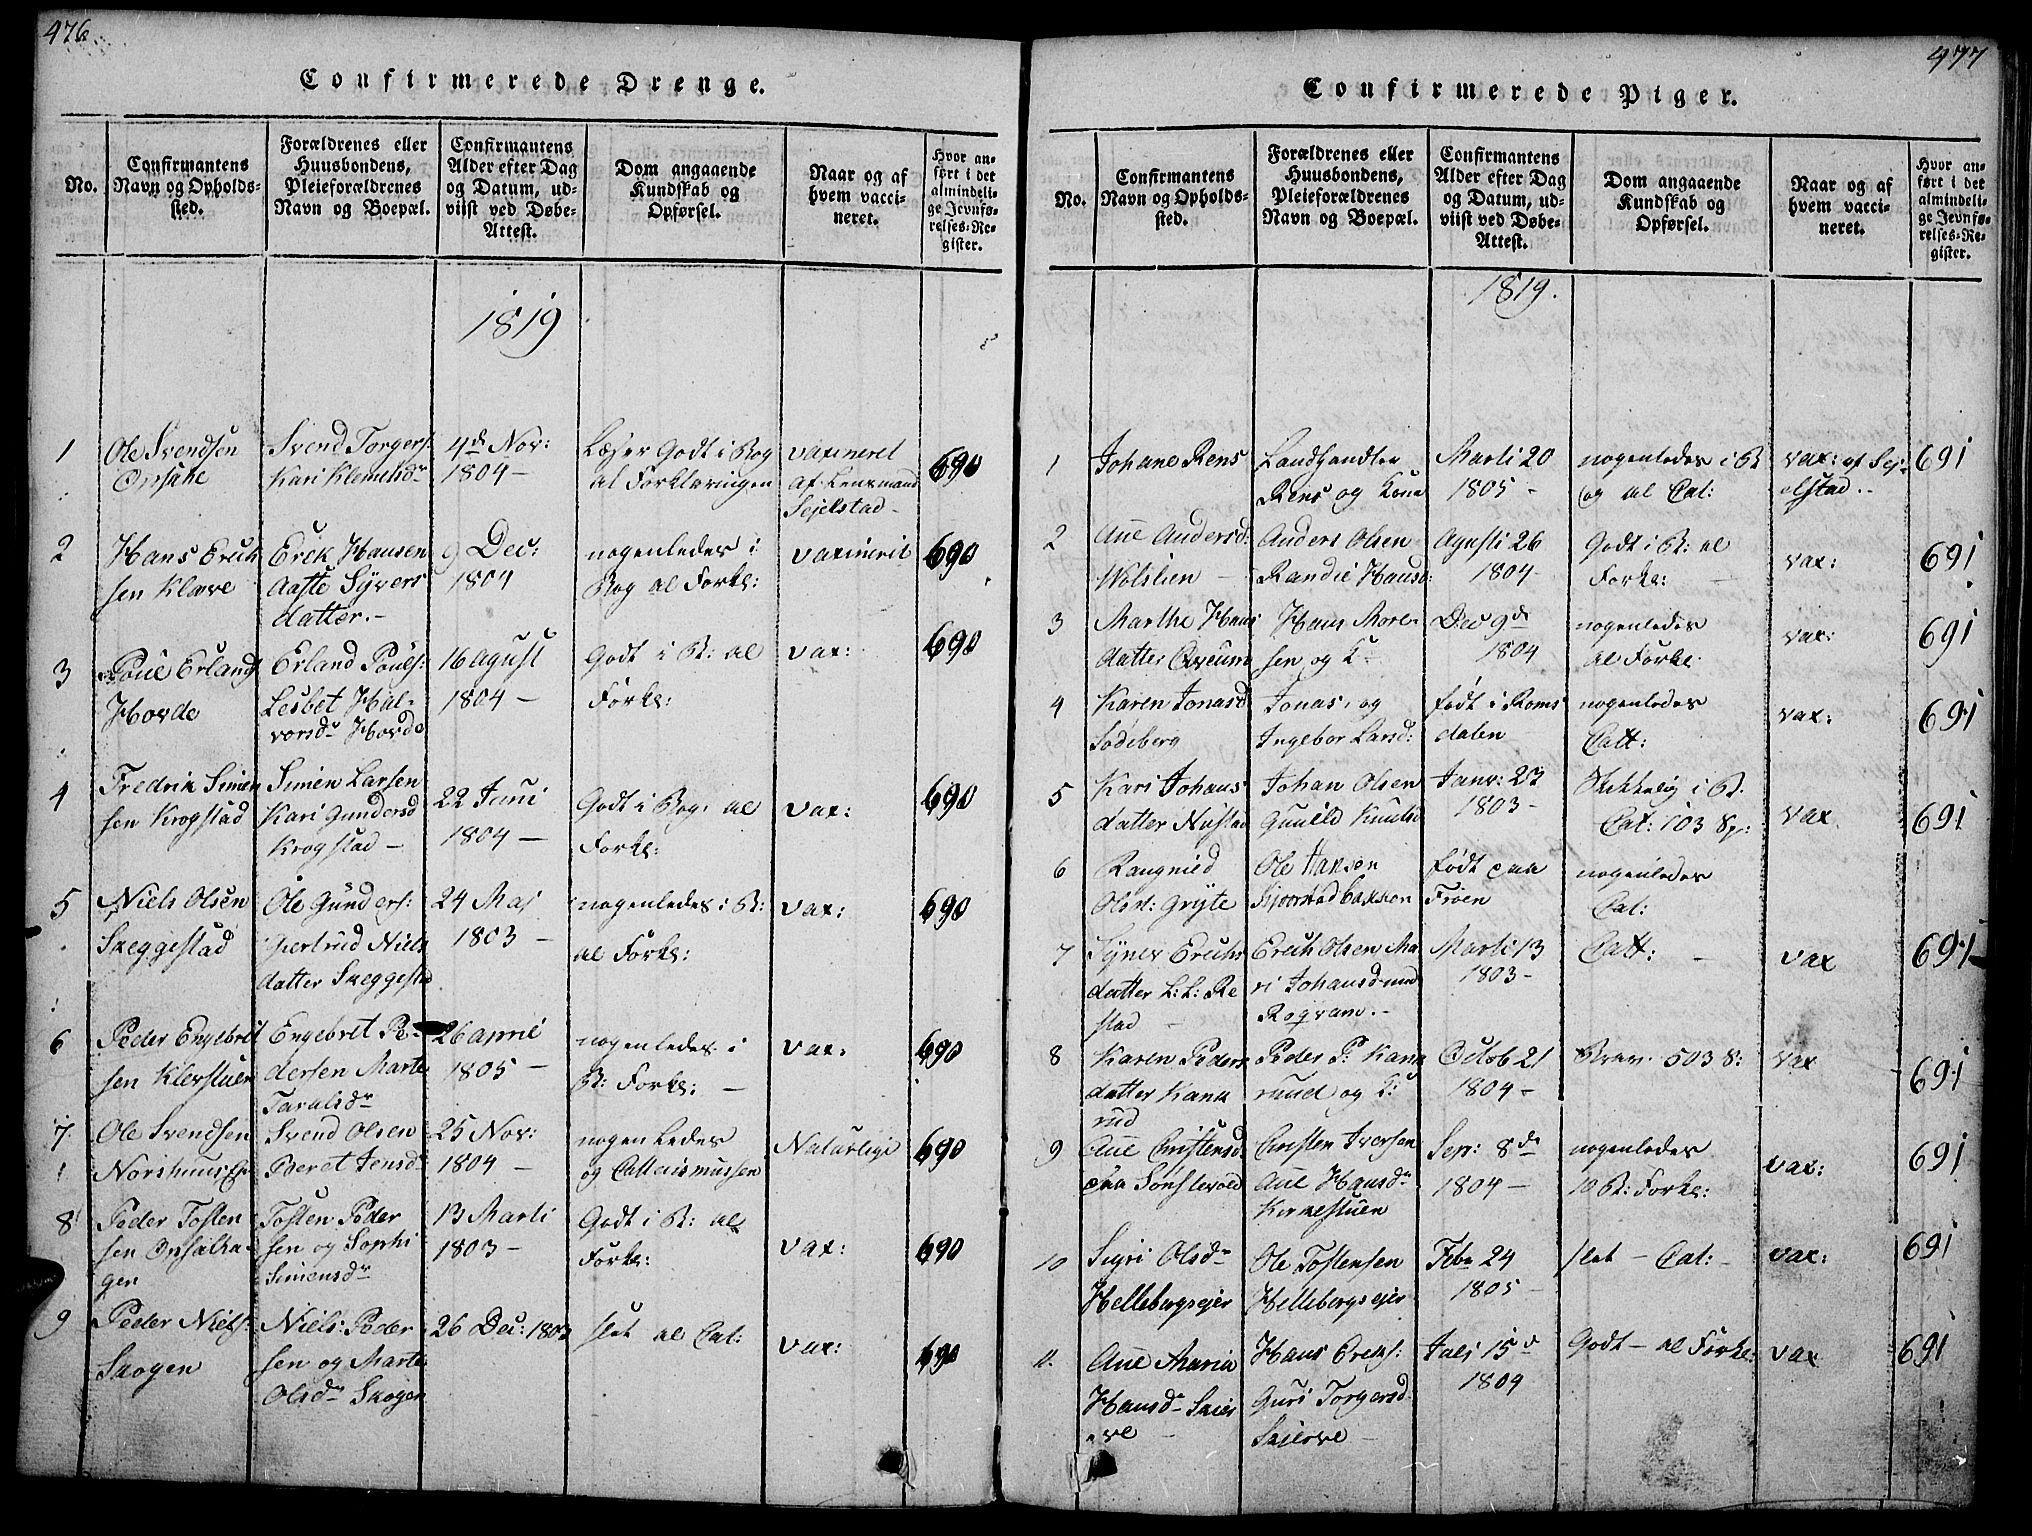 SAH, Gausdal prestekontor, Ministerialbok nr. 5, 1817-1829, s. 476-477